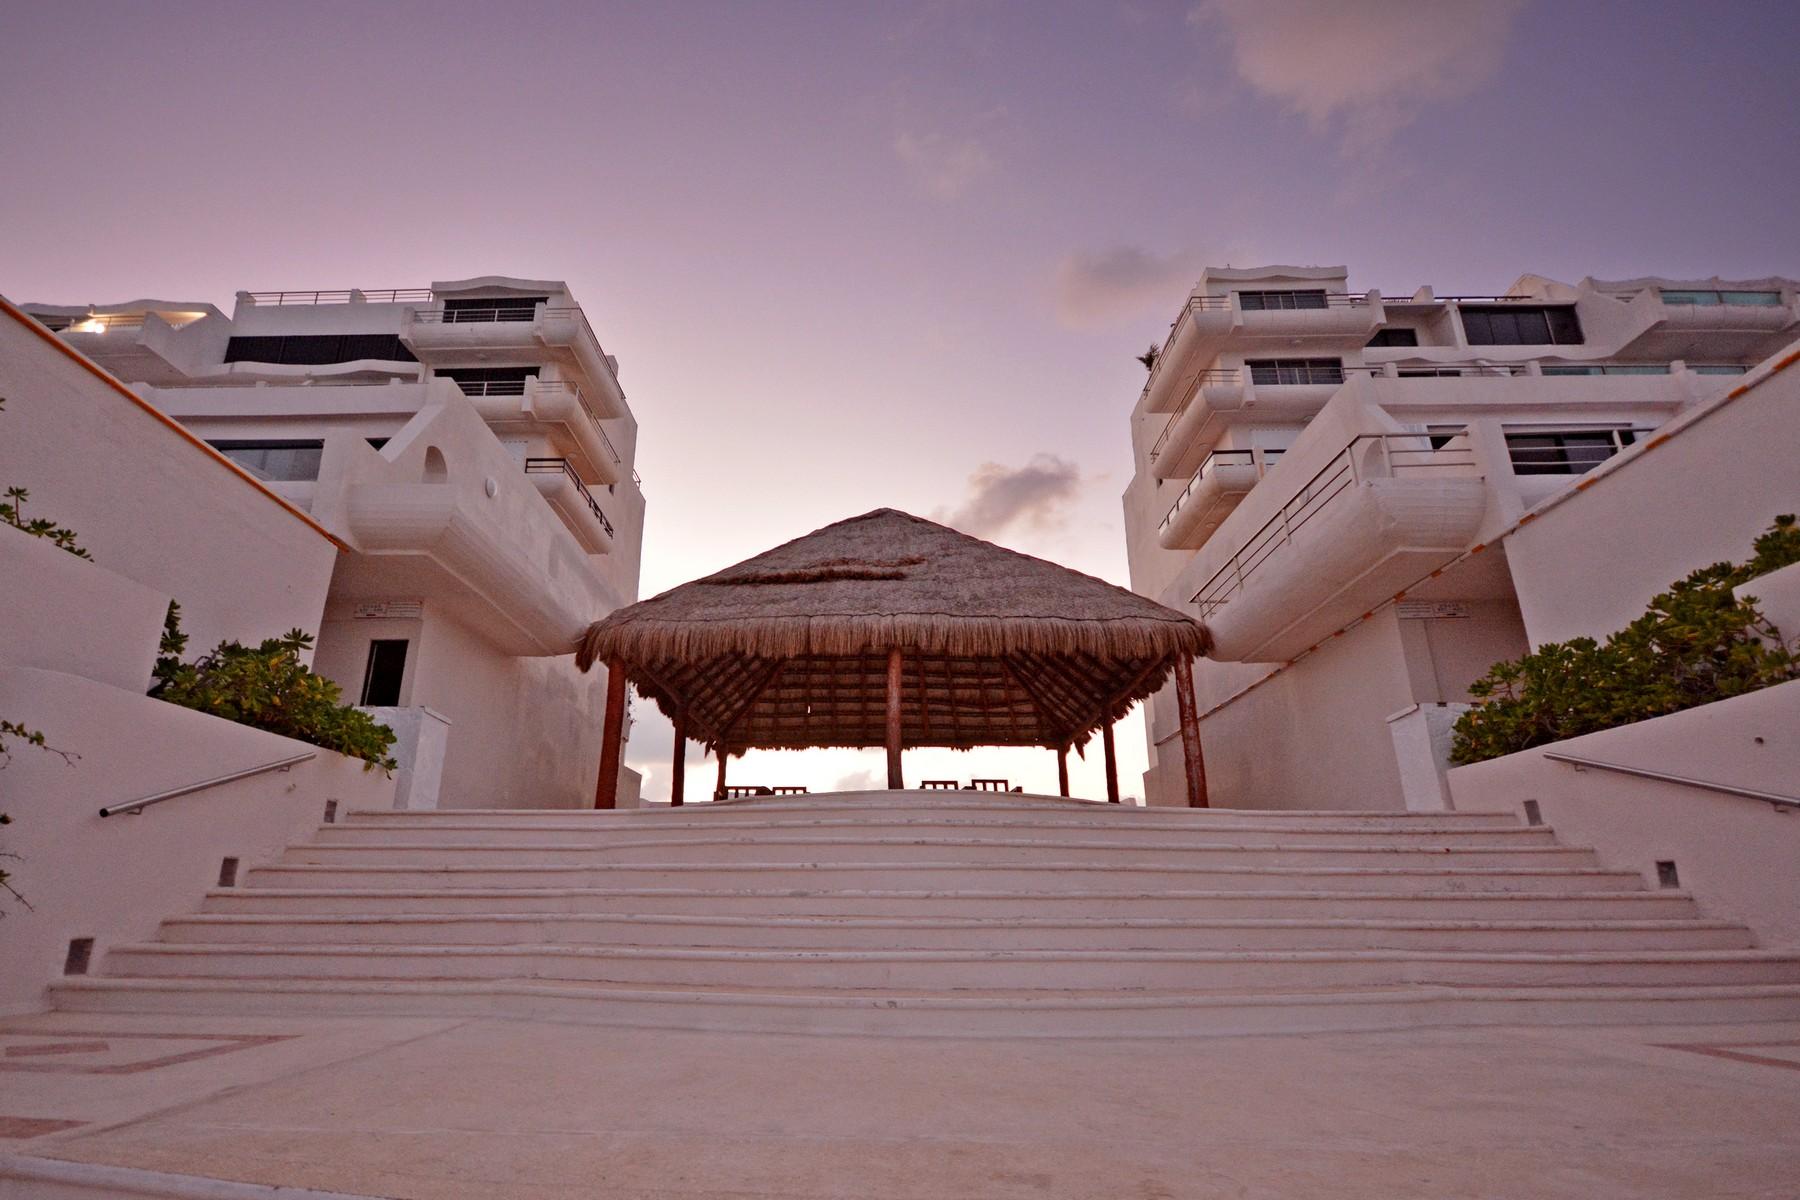 Additional photo for property listing at CANCUN BEACHFRONT VILLA Condominio Villas Marlin Depto. 121, Lte. 23 Cancun, Quintana Roo 77500 Mexico